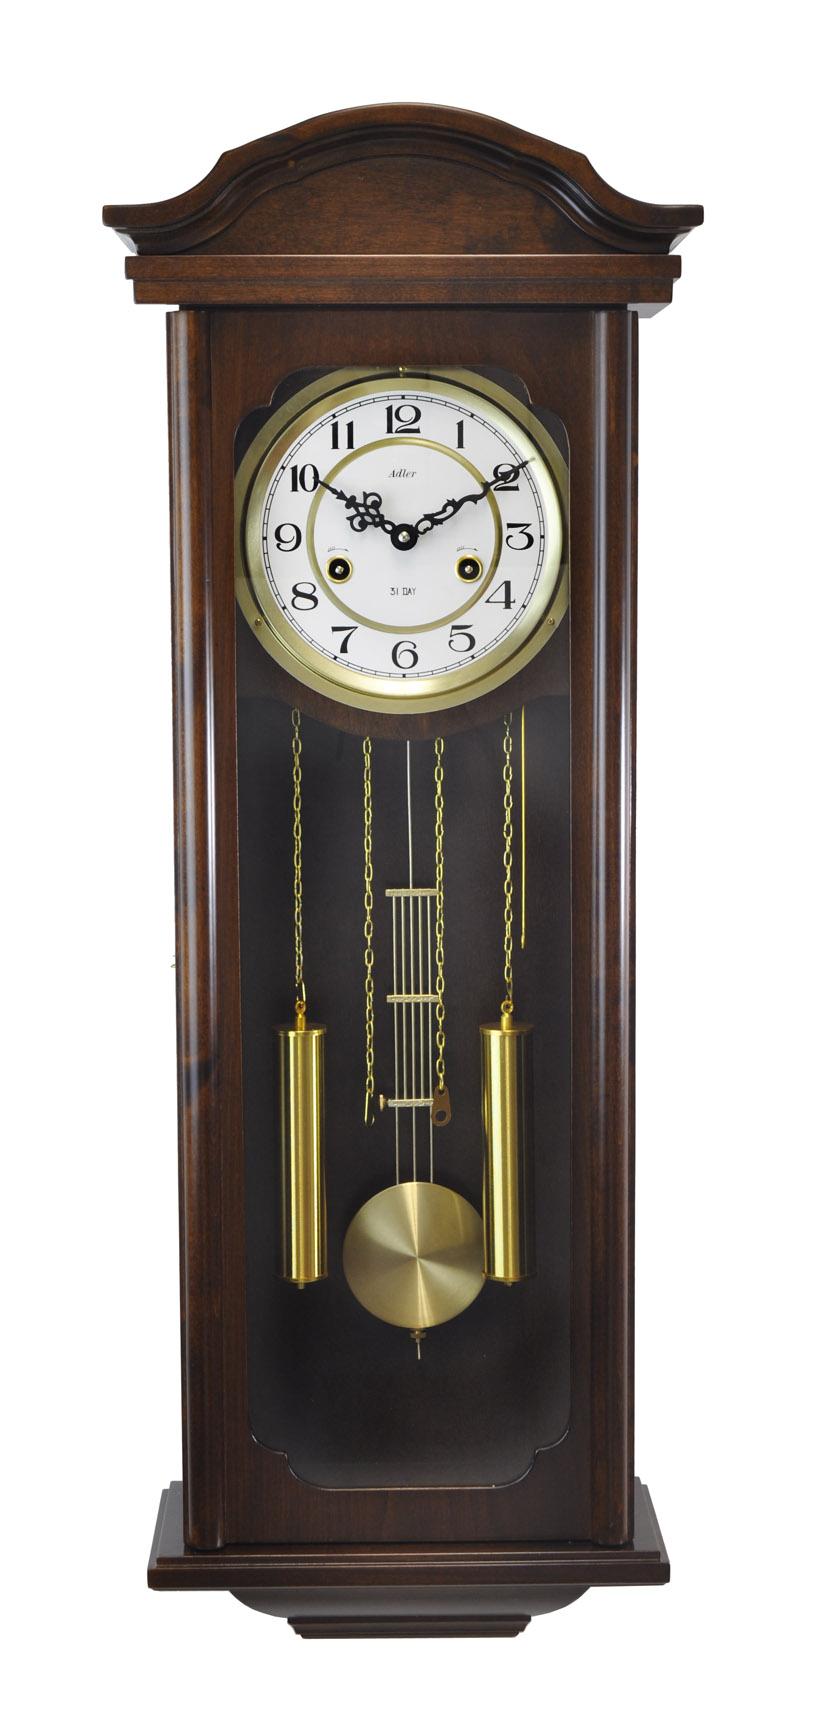 Kyvadlové hodiny Adler 11076-W